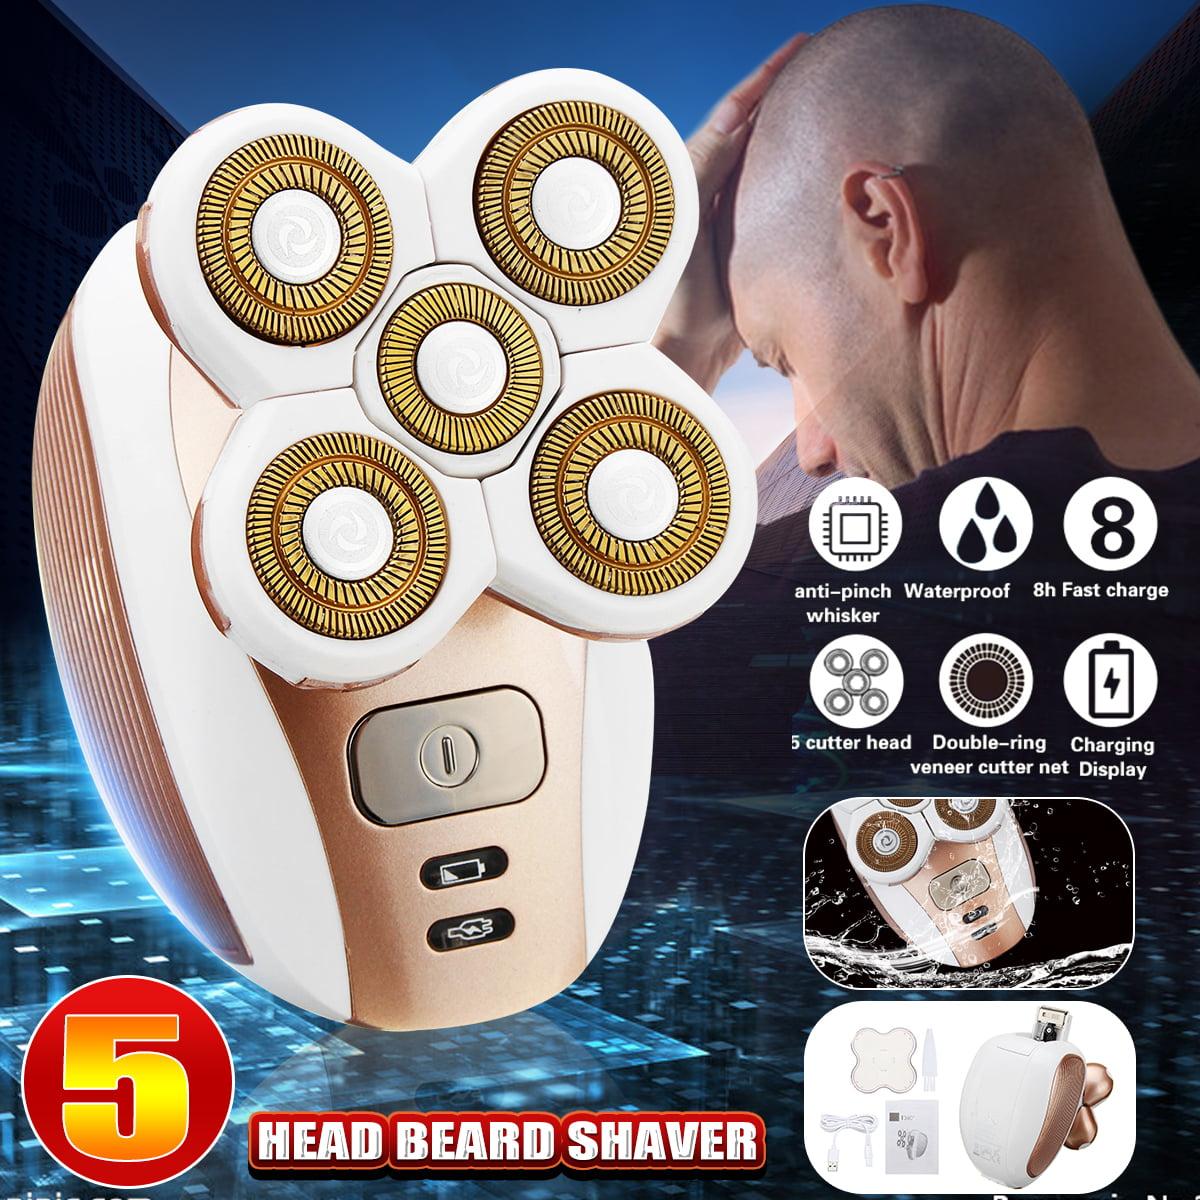 Waterproof 5 Head Electric Razor Shaver Bald Beard Hair Trimmer Eagle Remover Clipper Men /Women